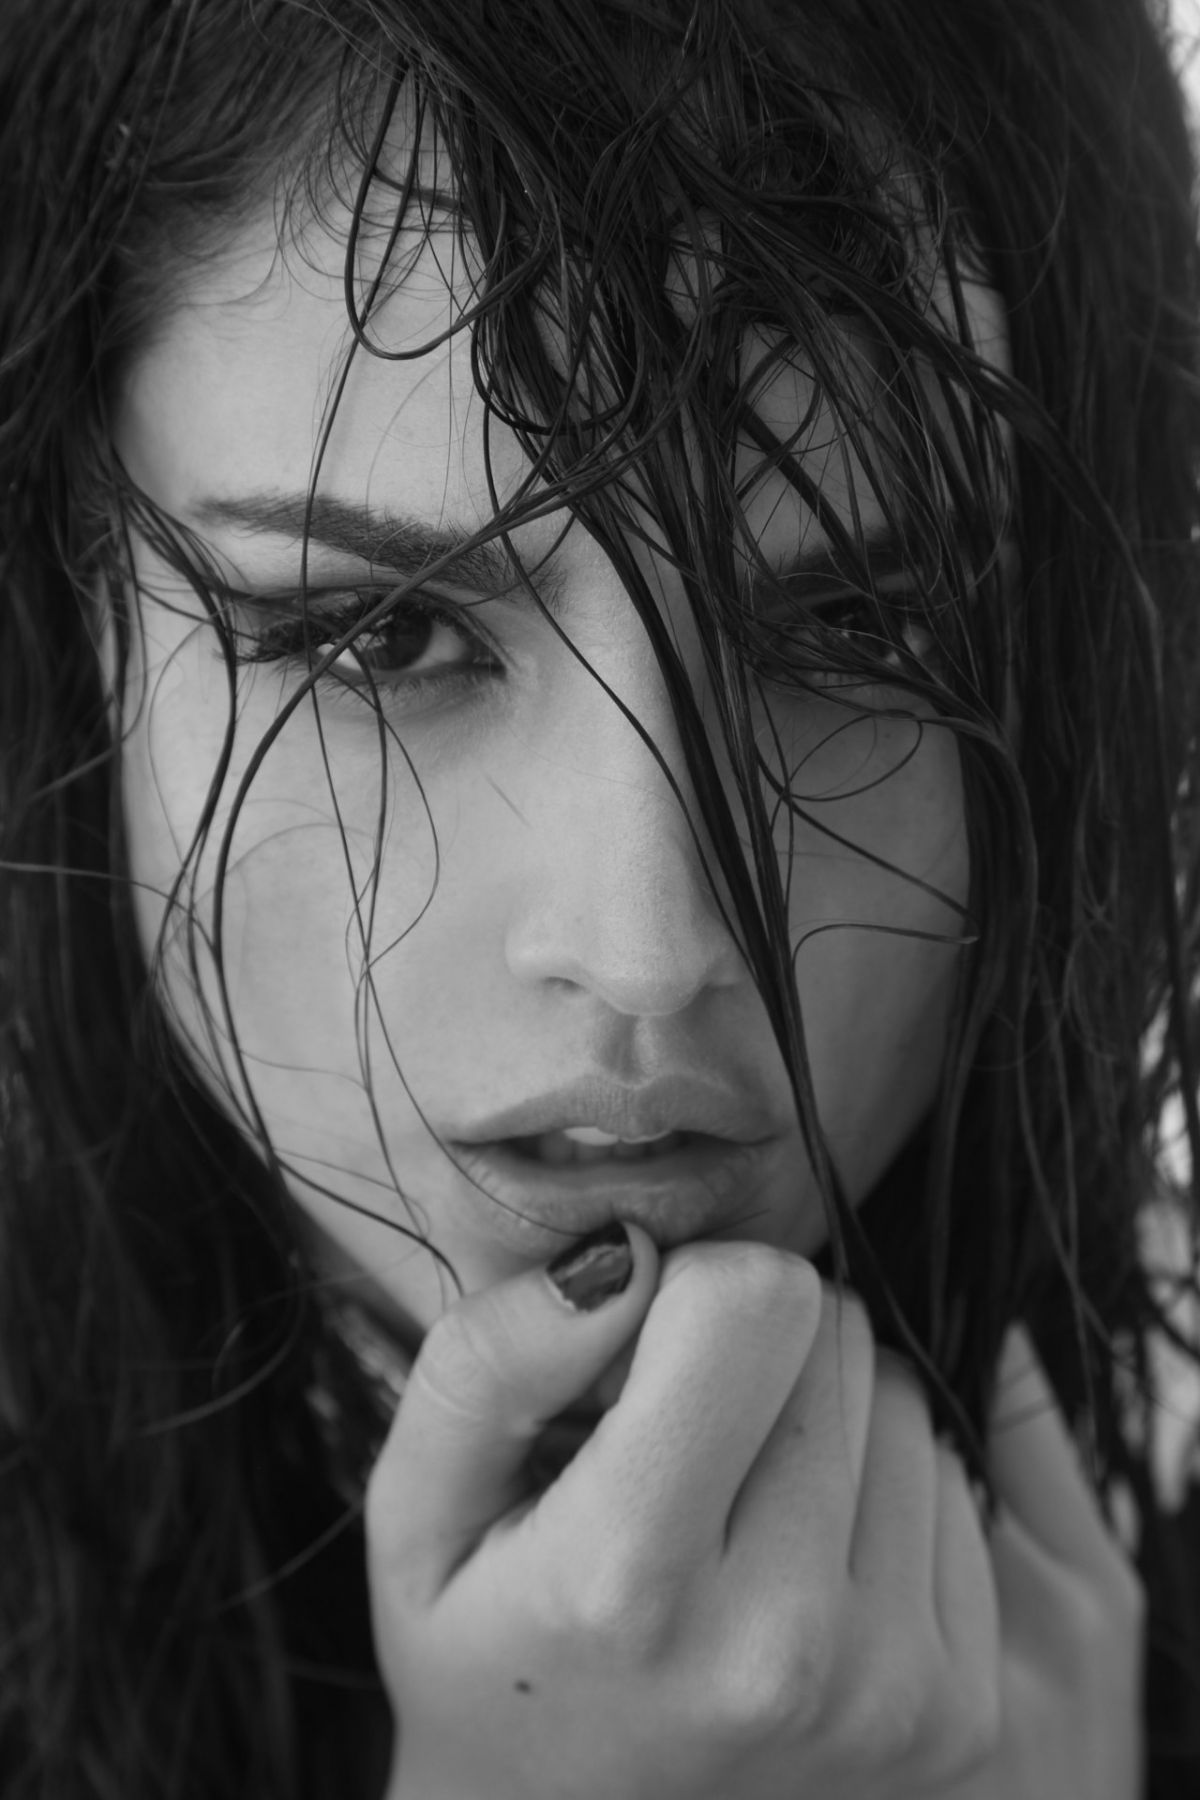 Eiza Gonzalez Eiza Gonzalez Wallpapers Images Photos Pictures Backgrounds Eiza Gonzalez Gonzalez Black And White Portraits